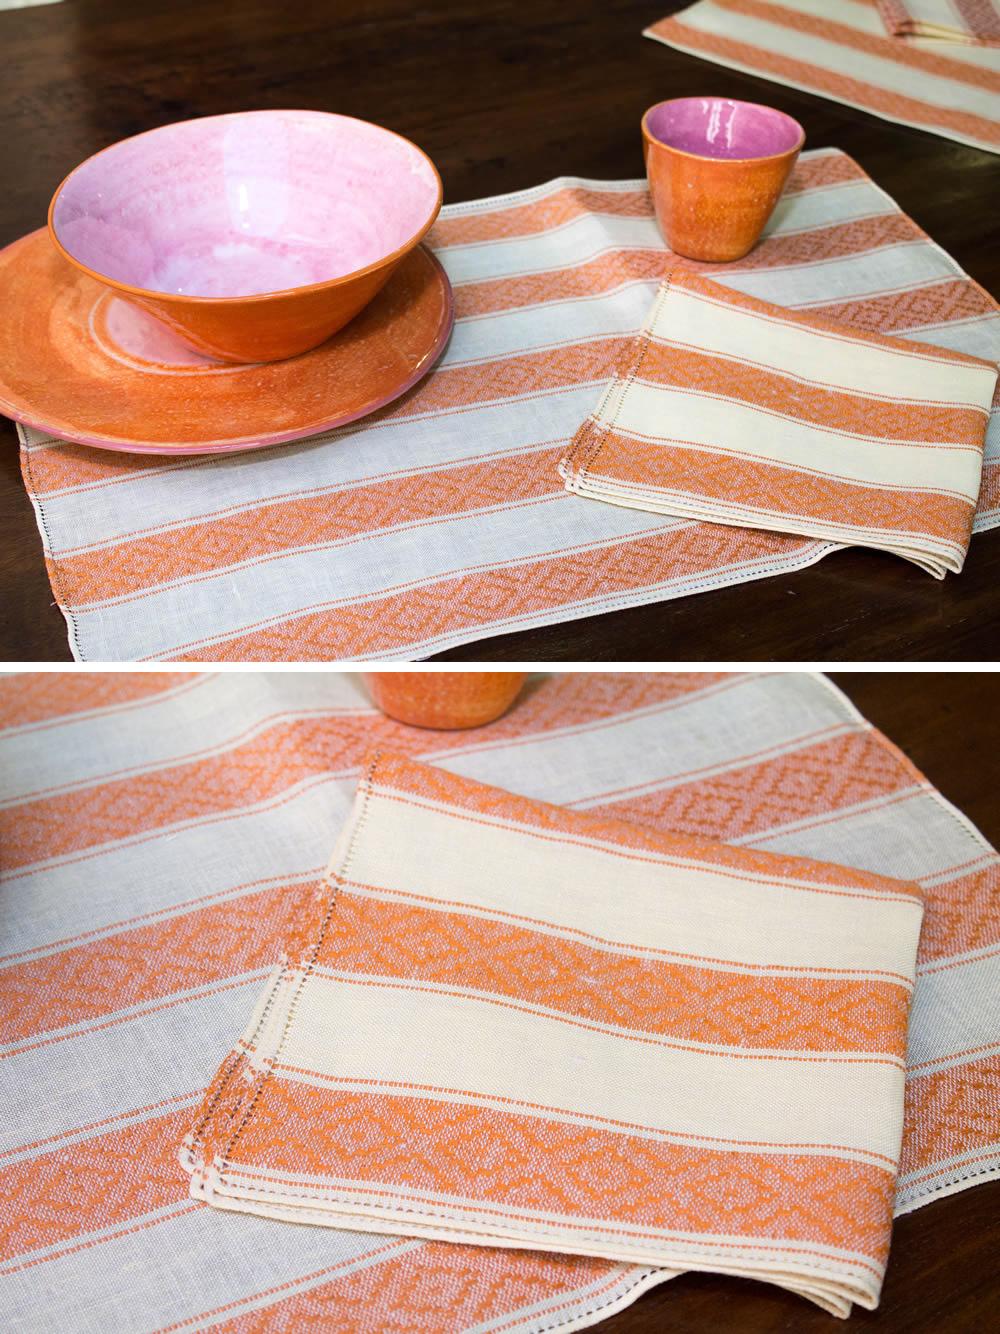 Centro tavola tessuto 11A classico color arancio Tela Umbra